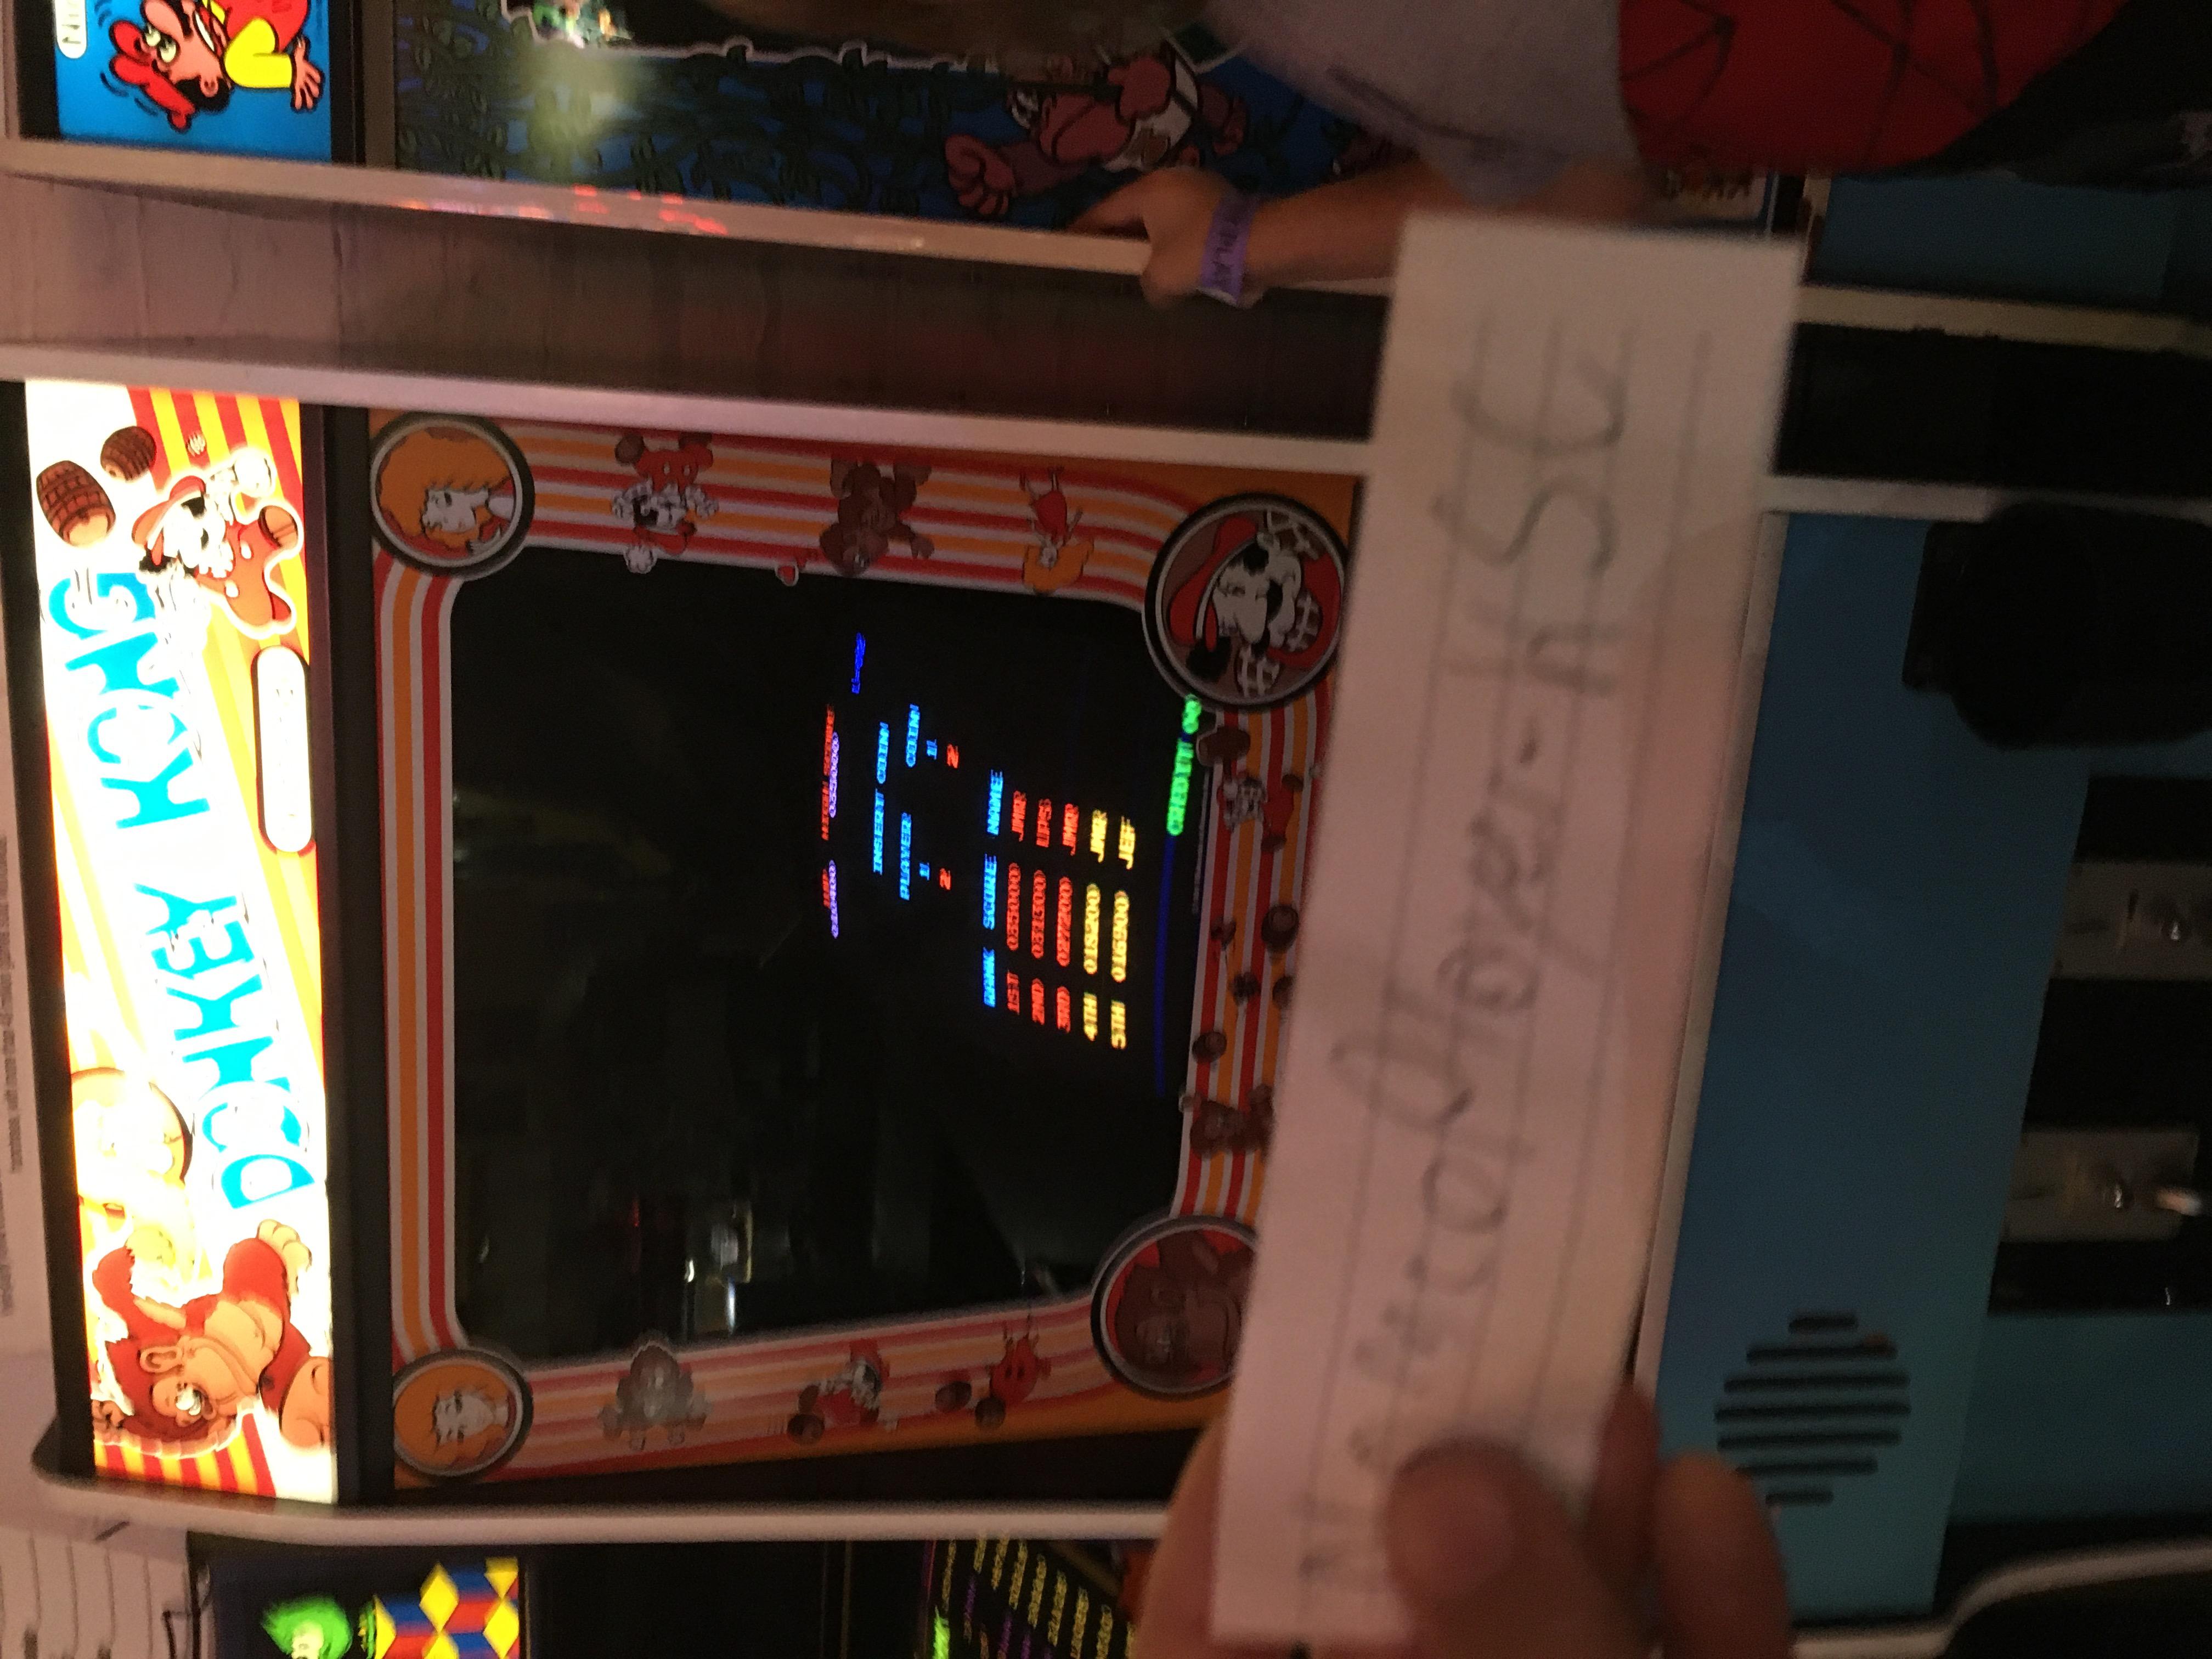 NamcoPlayer: Donkey Kong [No Hammer Challenge] (Arcade) 10,400 points on 2020-10-11 08:05:17